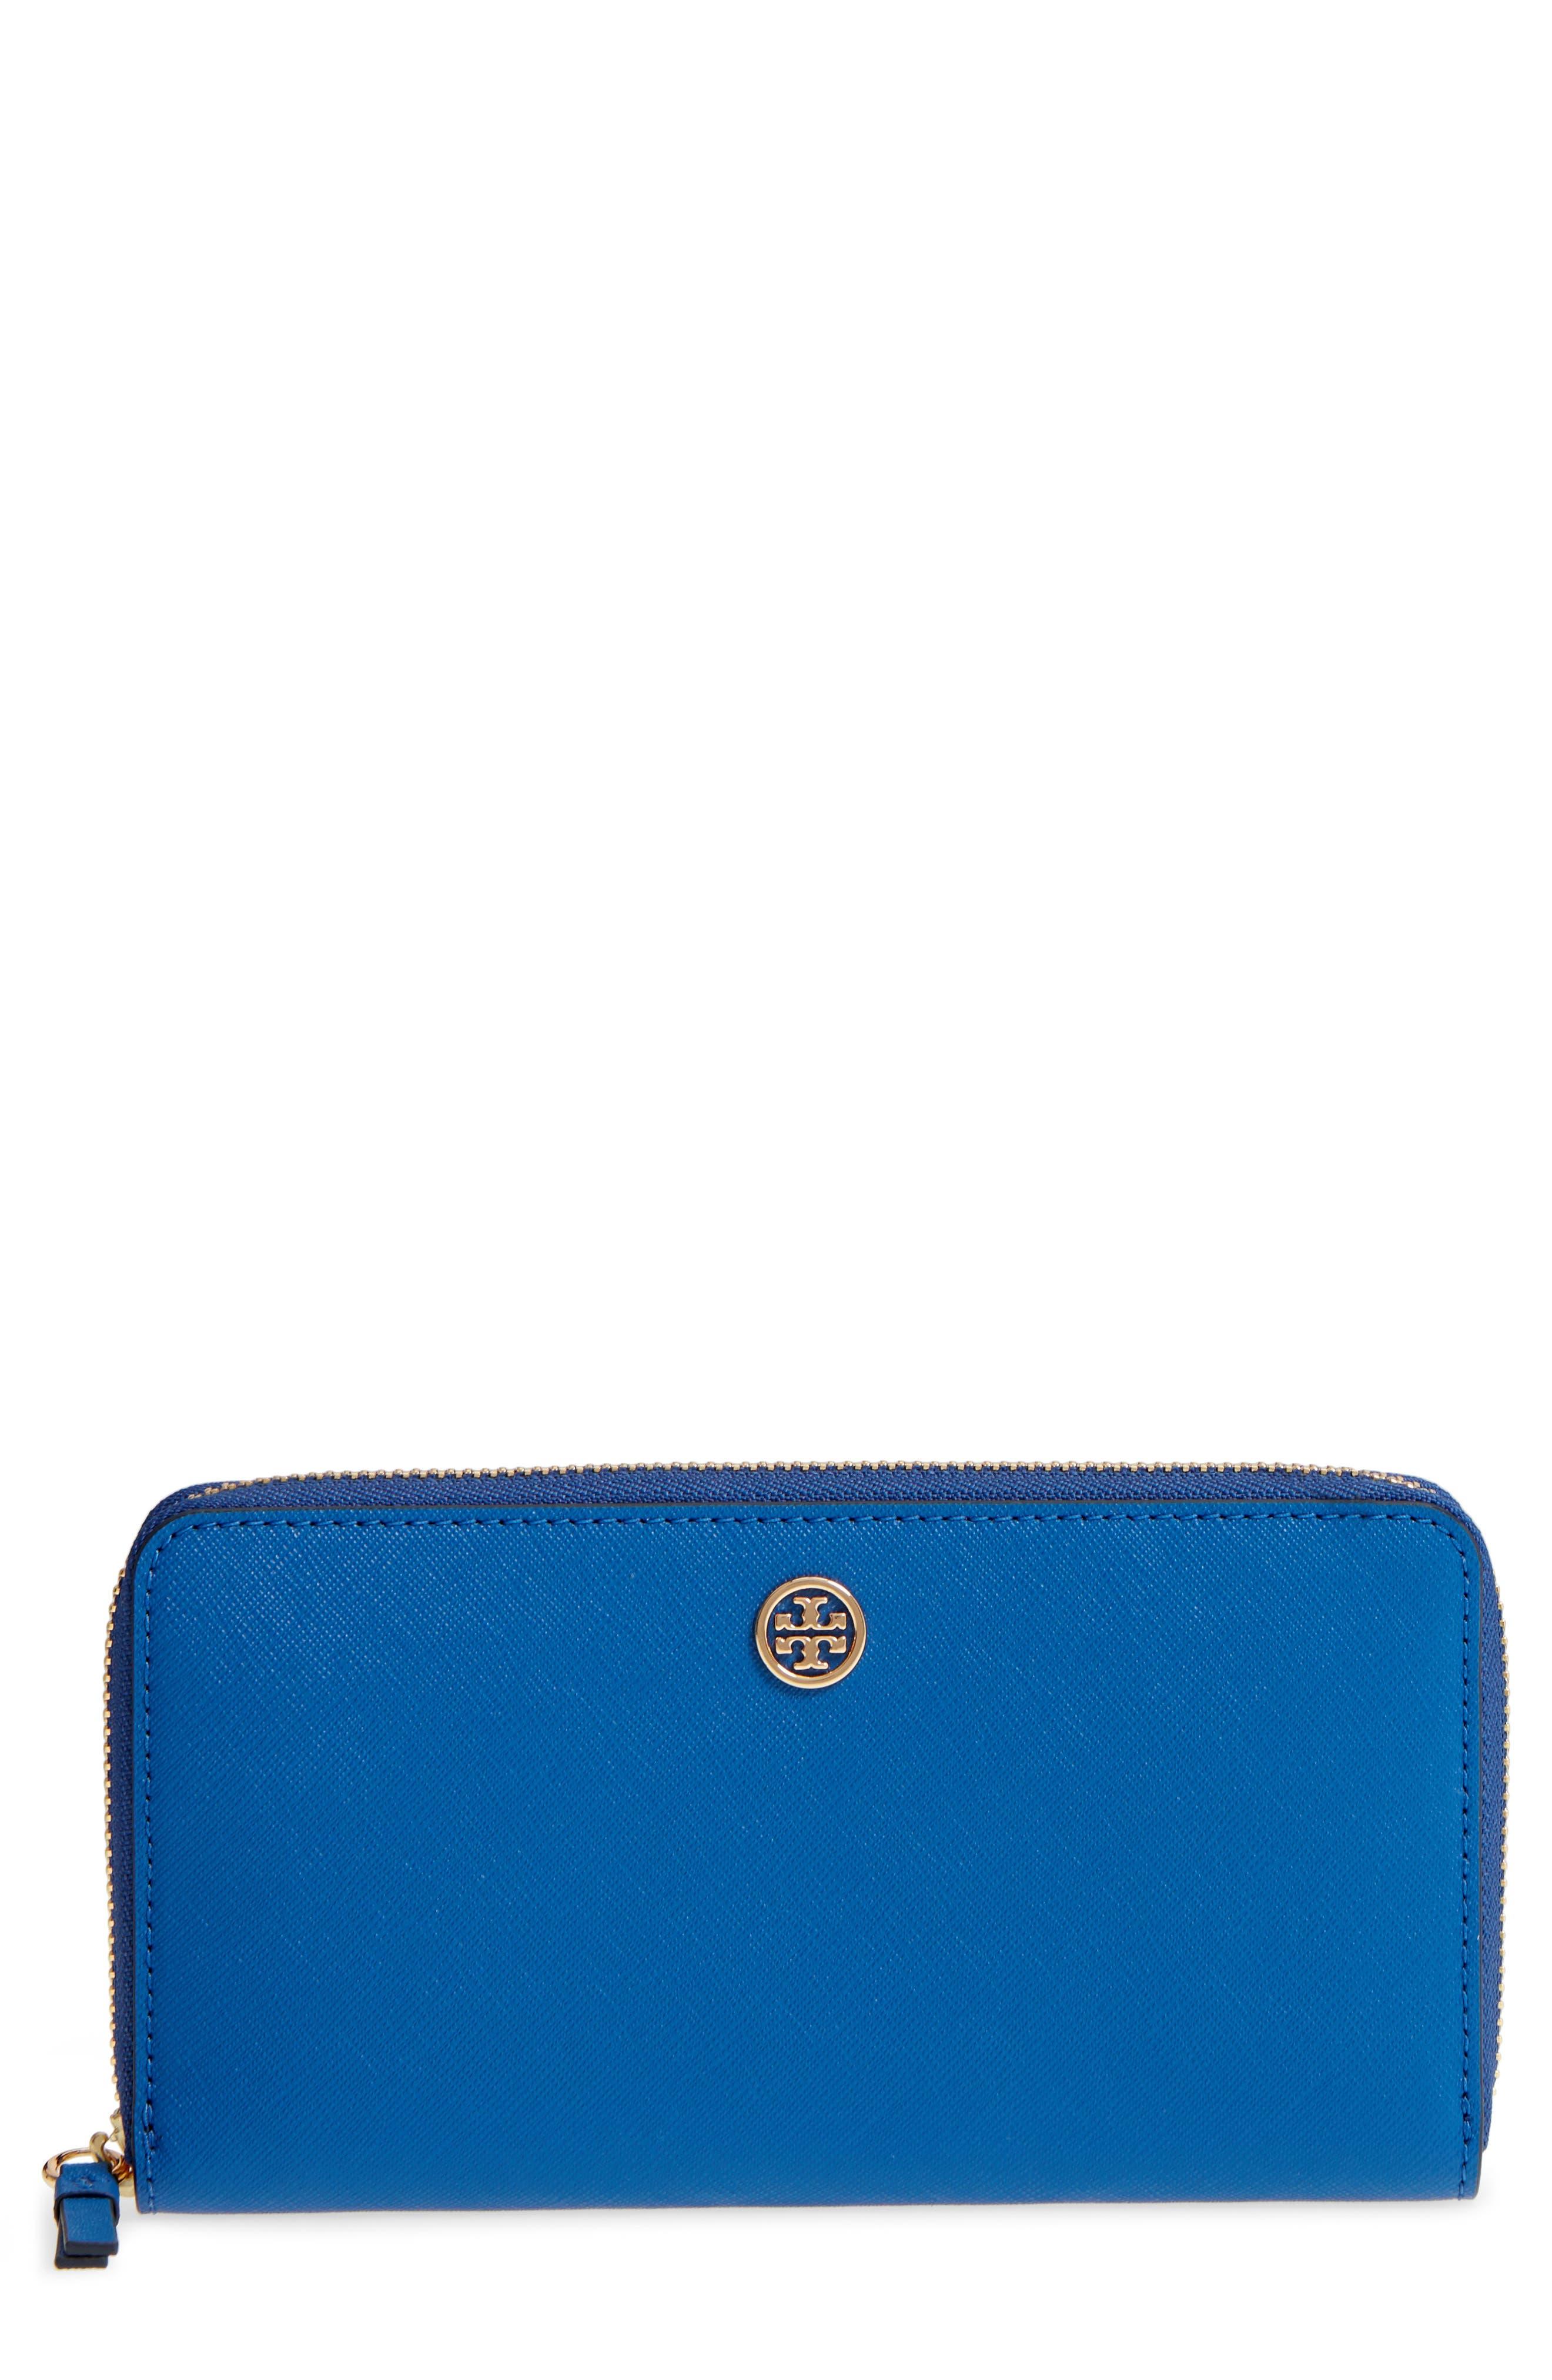 Robinson Zip Continental Wallet,                         Main,                         color, Regal Blue / Royal Navy